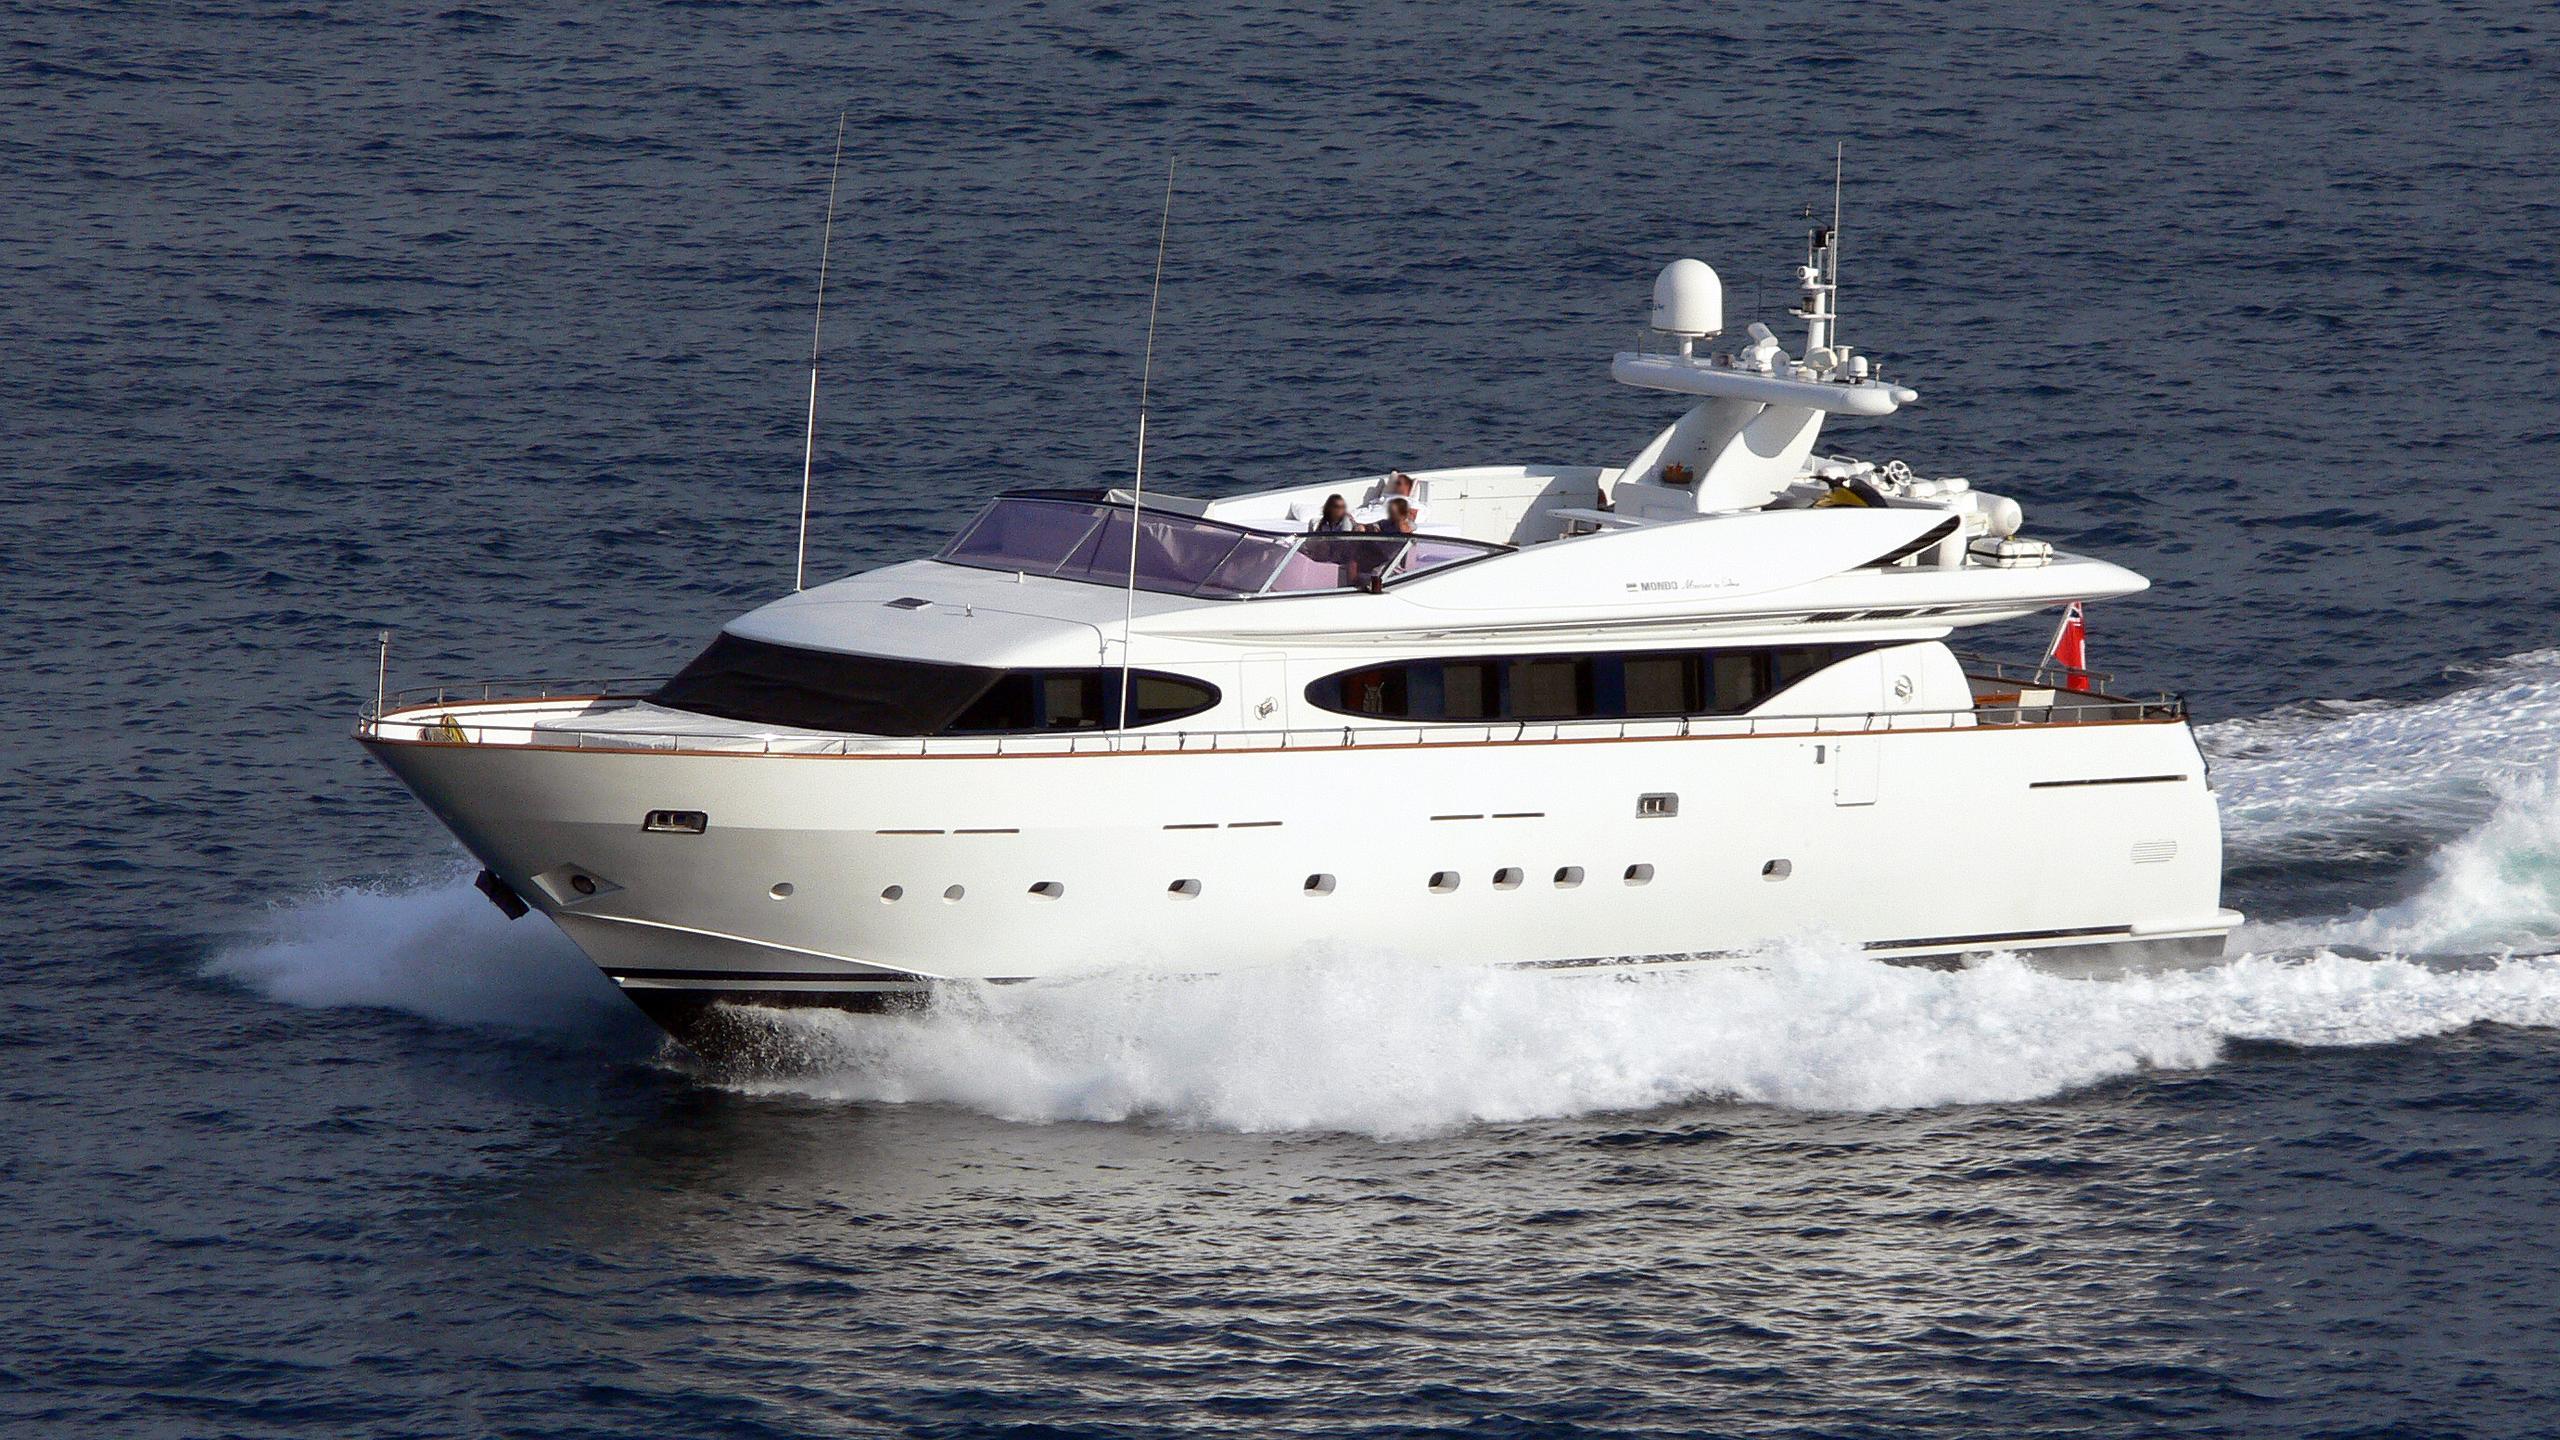 talila-motor-yacht-mondomarine-mondo-29m-2000-28m-cruising